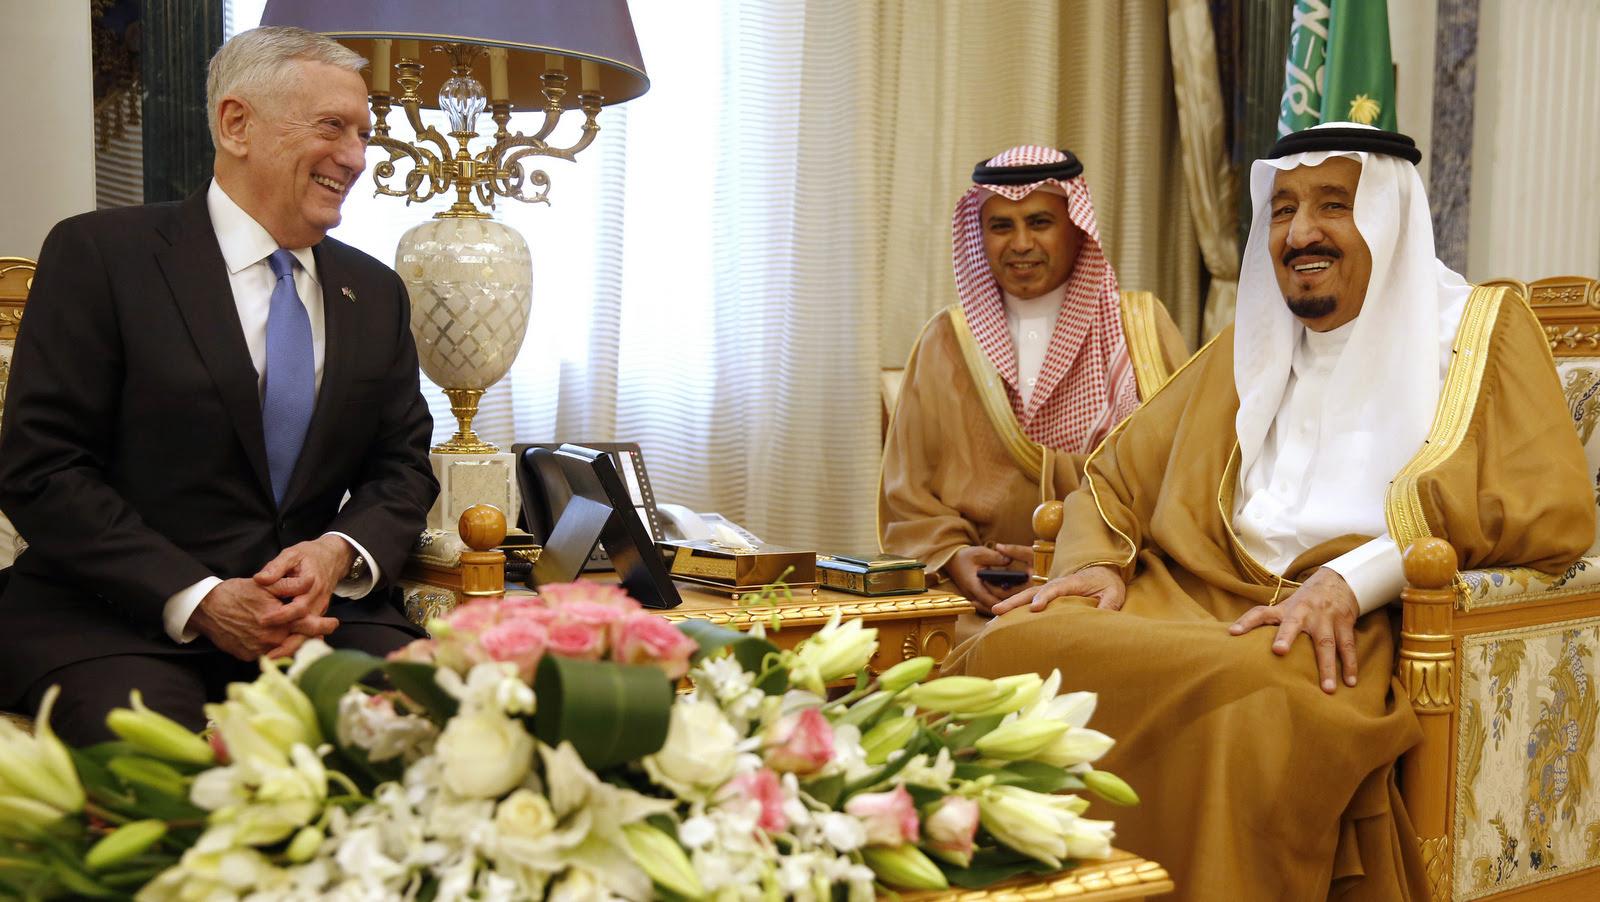 Saudi Arabia's King Salman meets with U.S. Defense Secretary James Mattis, in Riyadh, April 19, 2017. (Jonathan Ernst/AP)